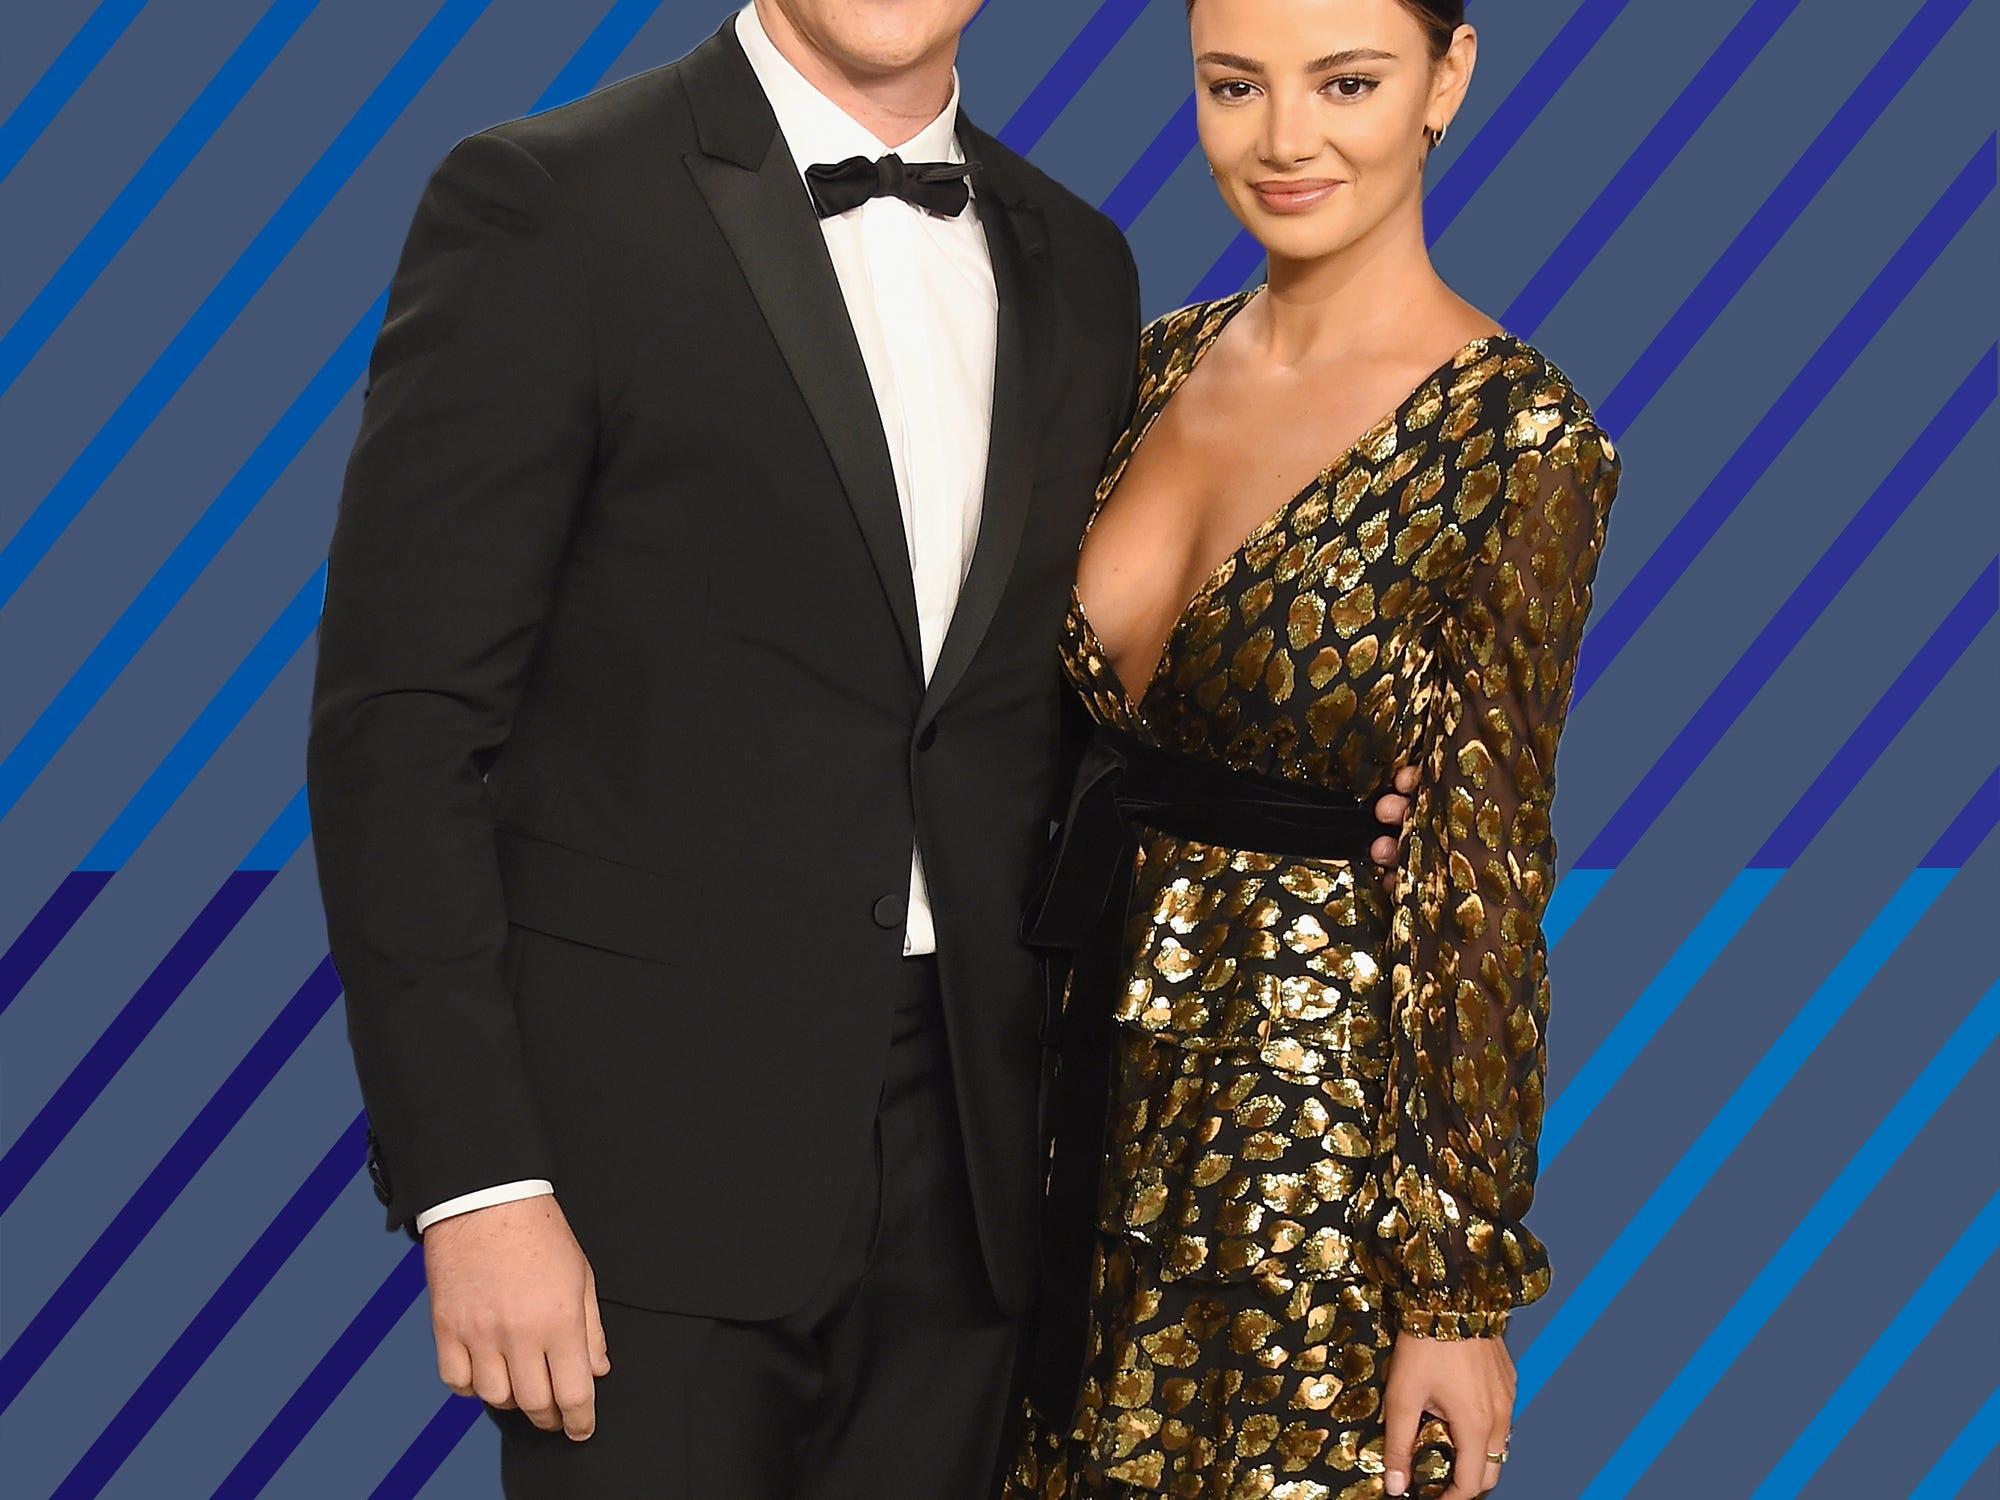 Greys Anatomy Star Camilla Luddington Married